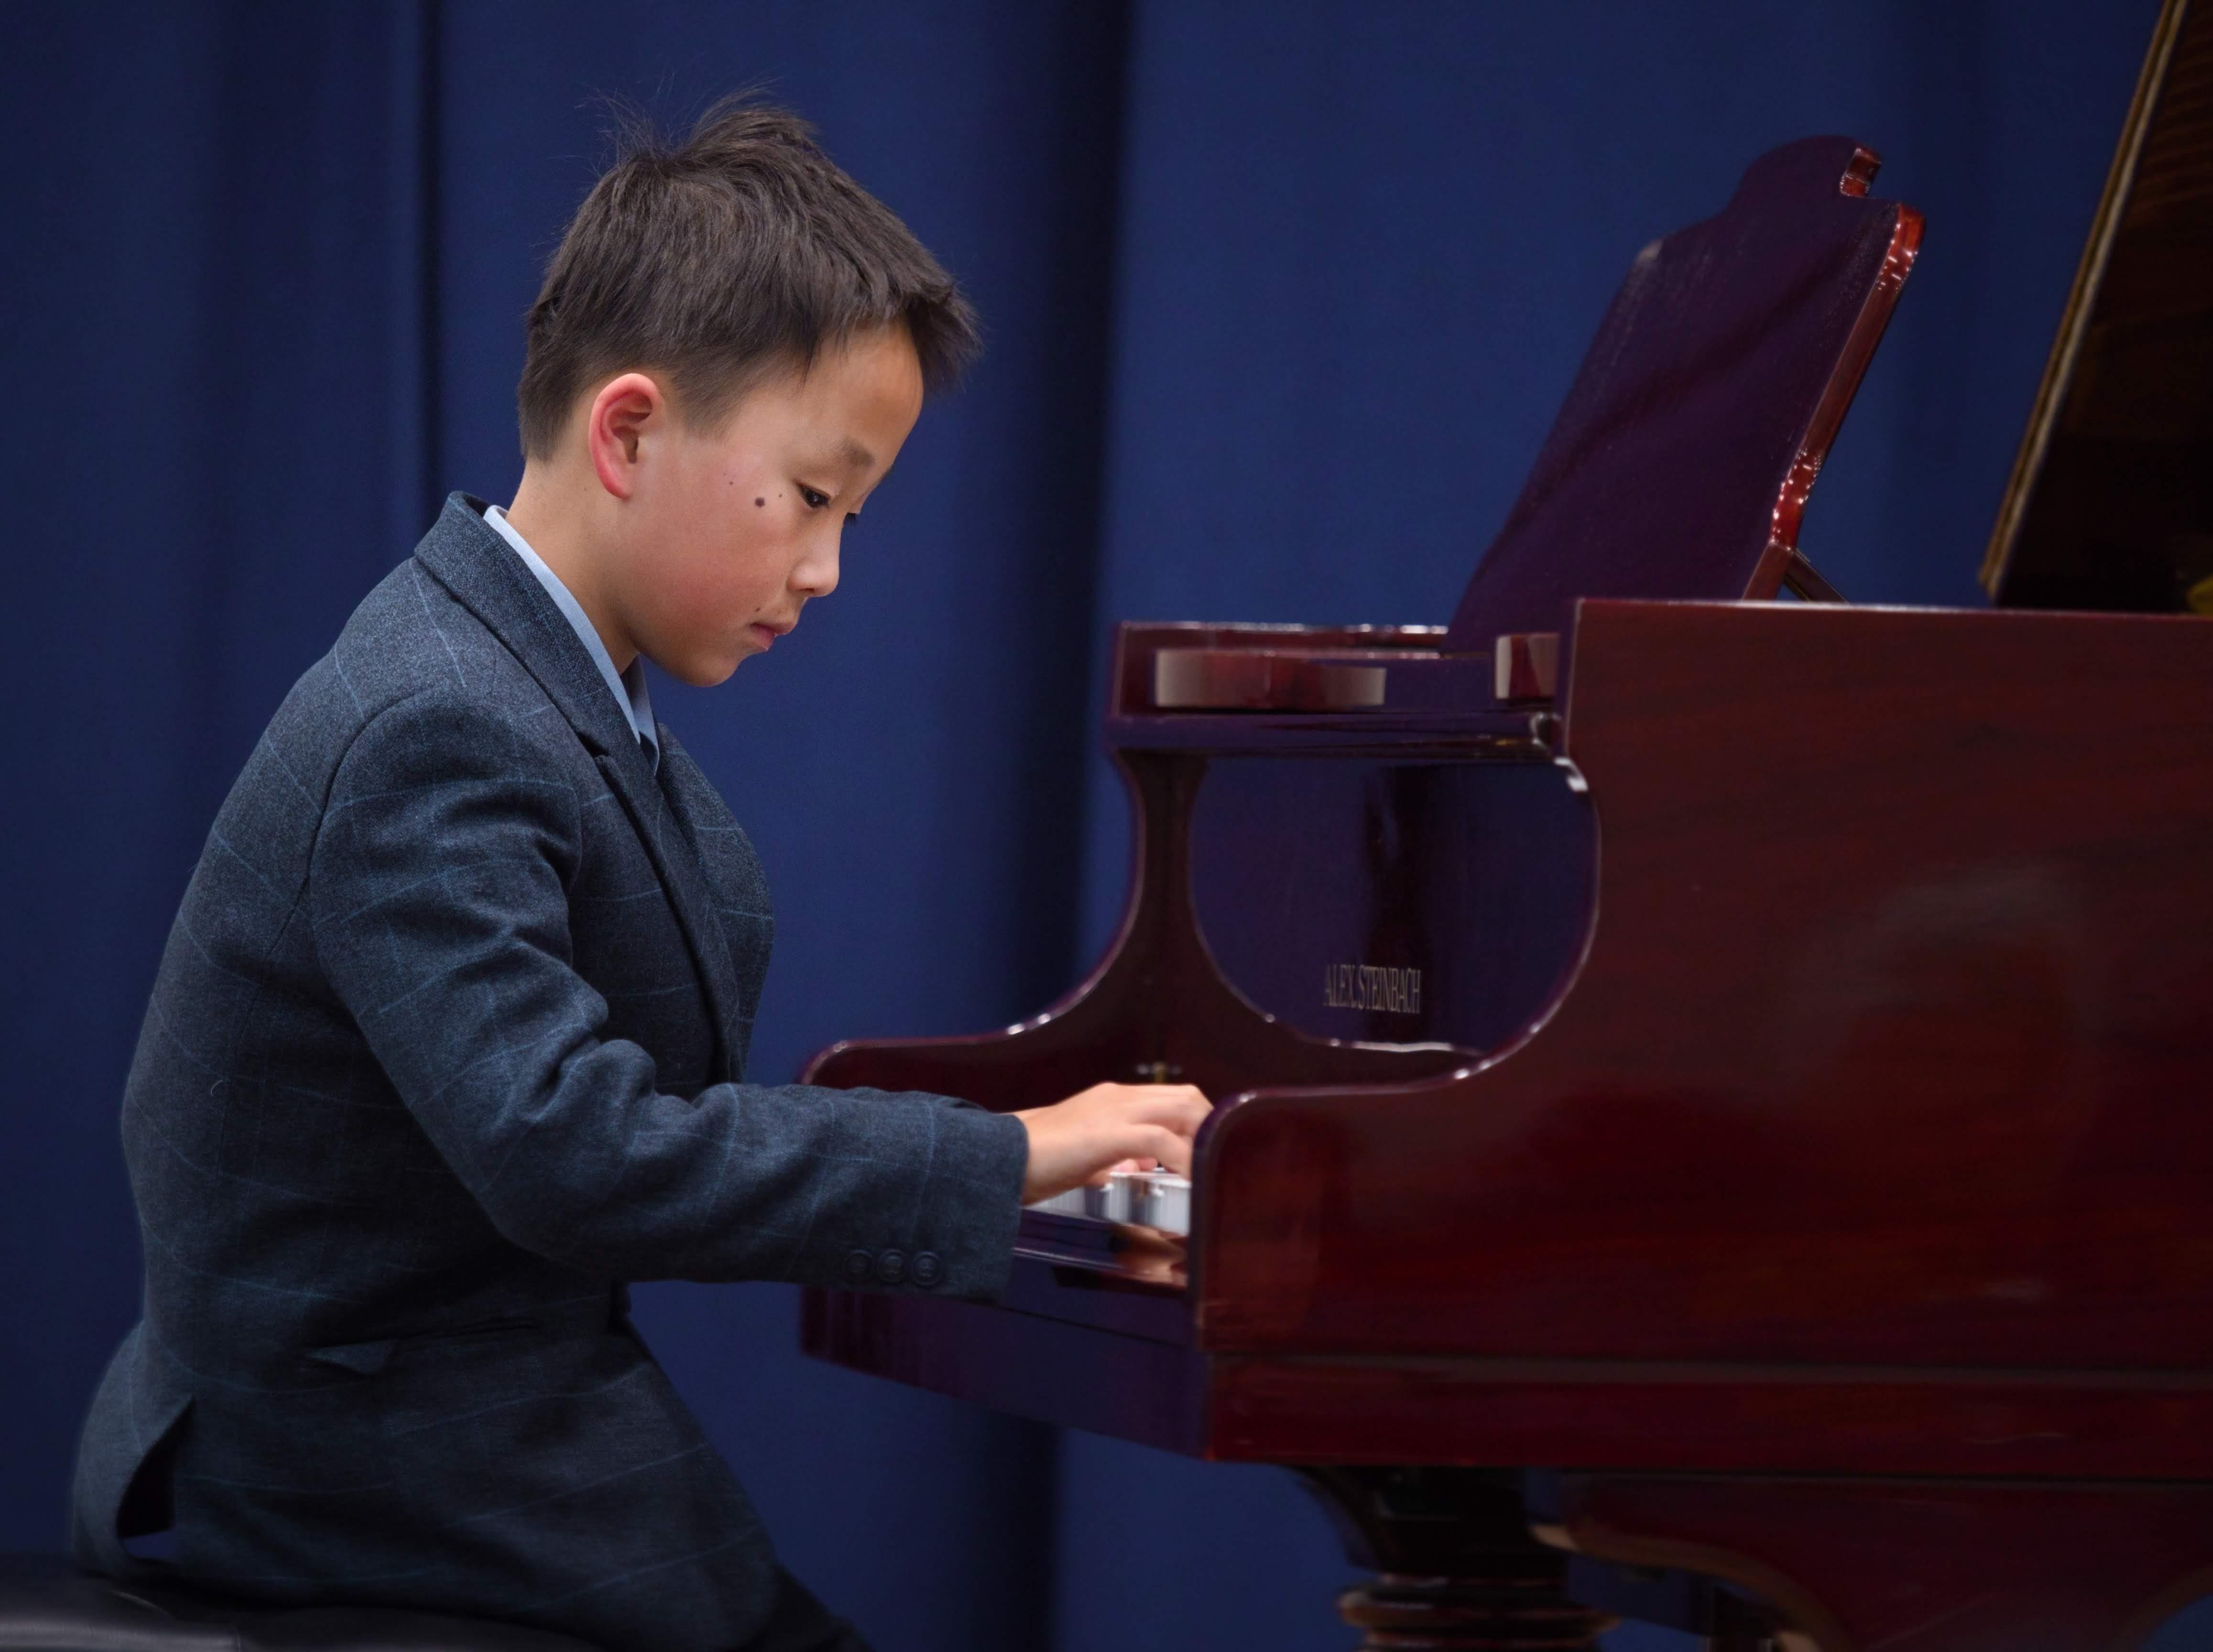 WGE Pianoforte Day 1 Harry Zhou Displays his skills on the Piano